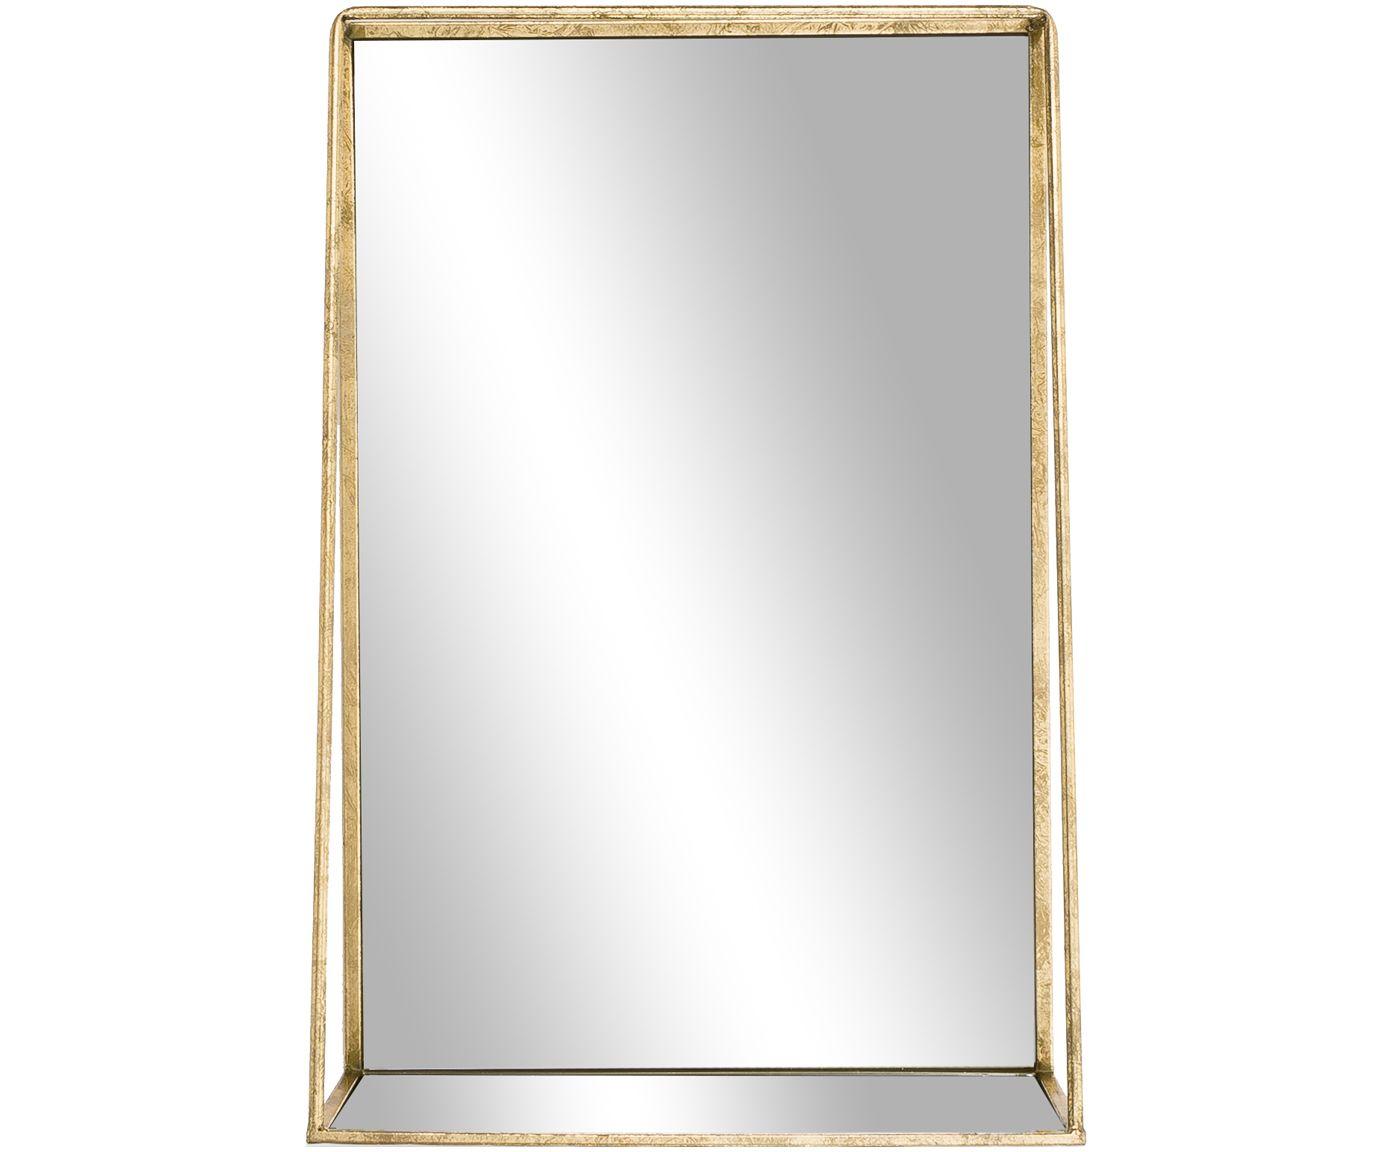 Wandspiegel Solina aus Metall in Gold   WestwingNow   Wandspiegel ...